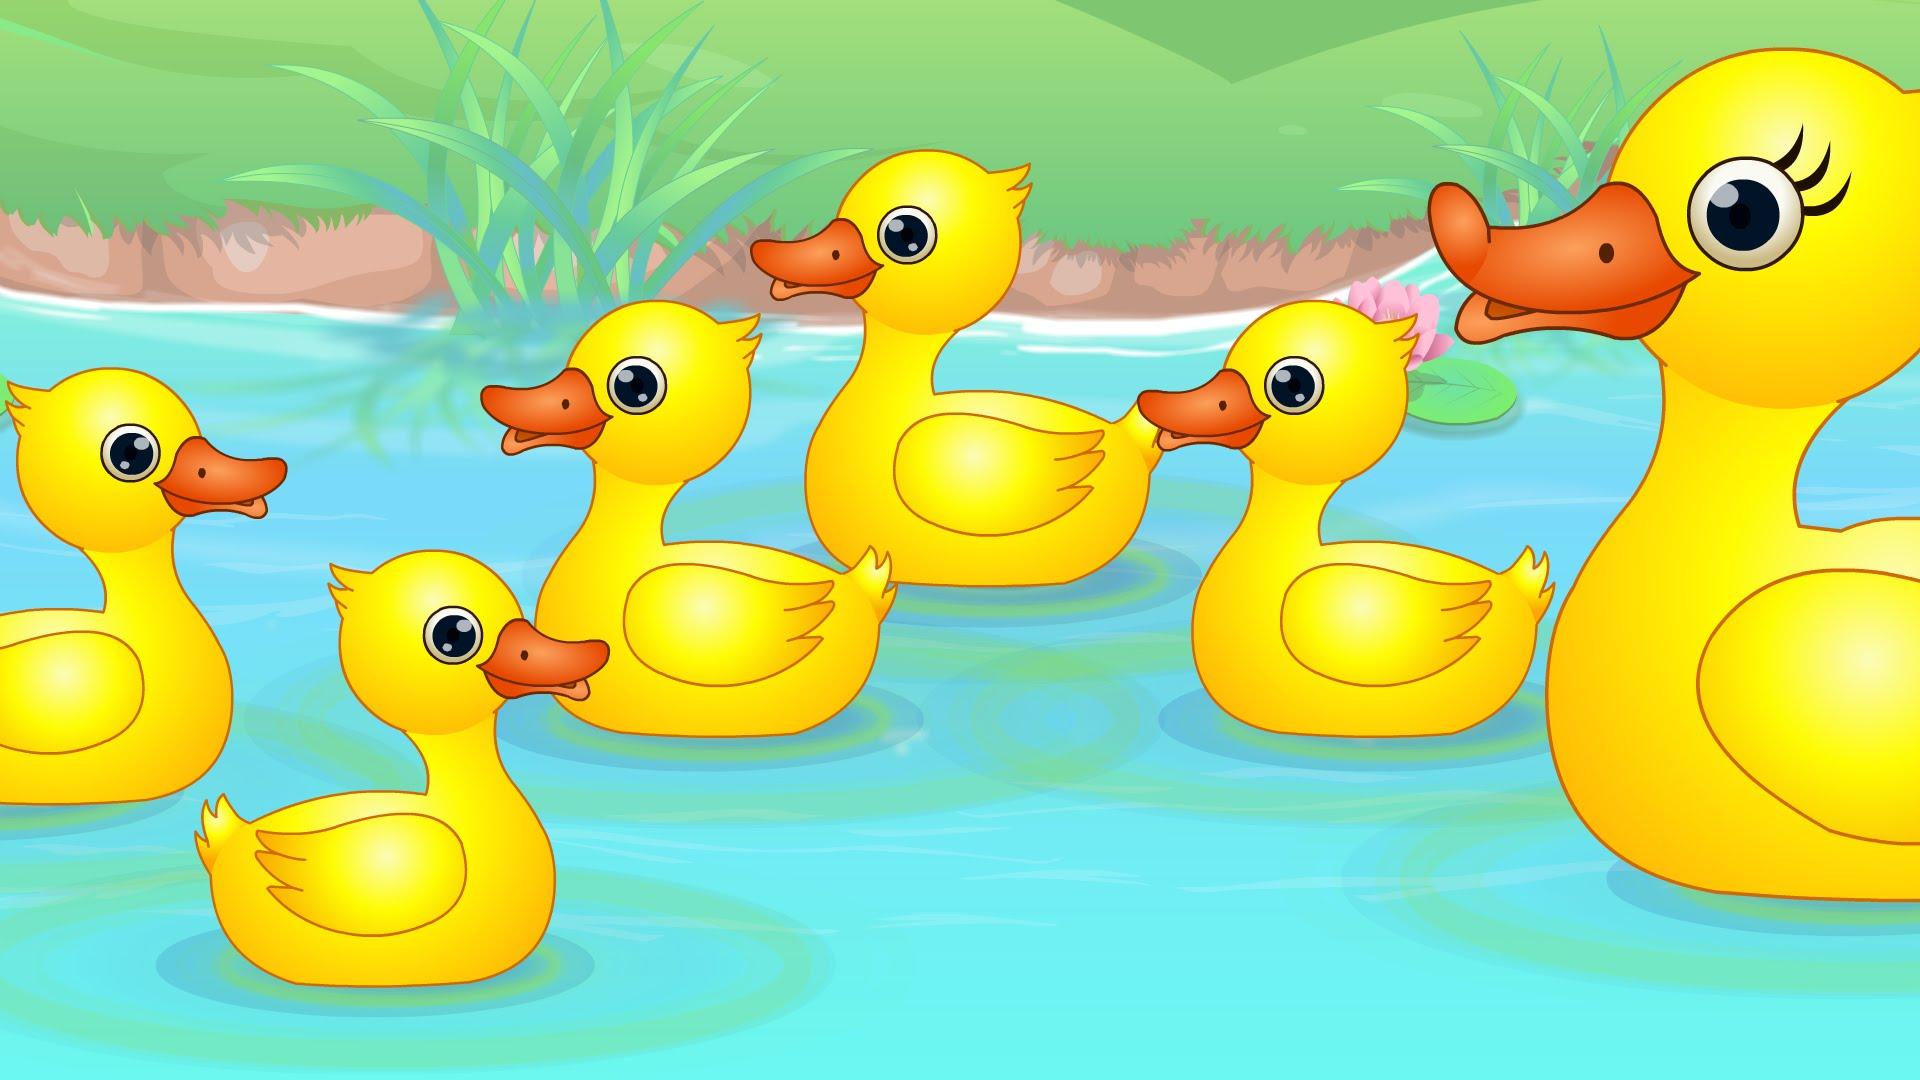 4 Clipart Little Duck 4 Little Duck Transparent Free For